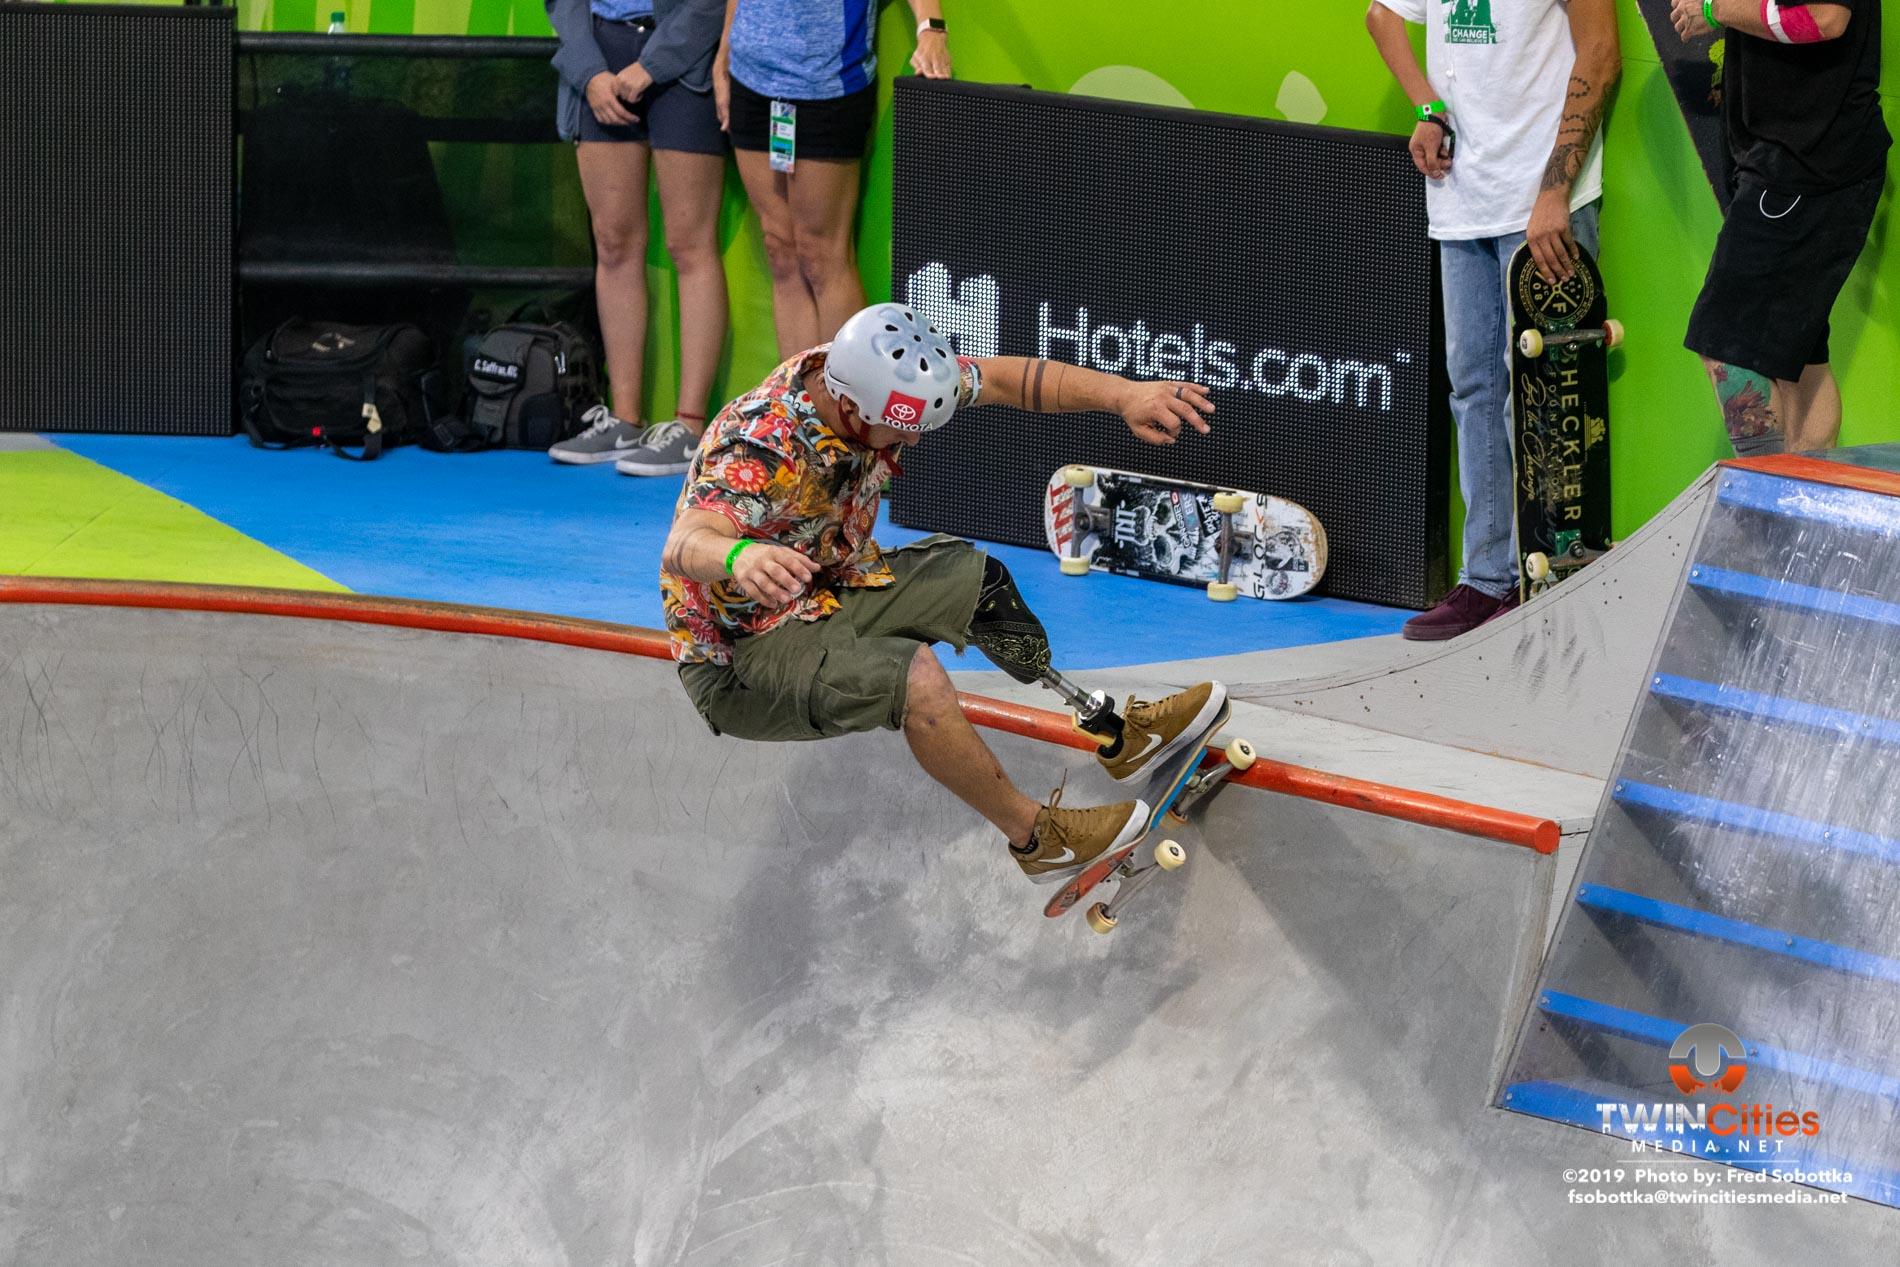 Adaptive-Skateboard-Park-04